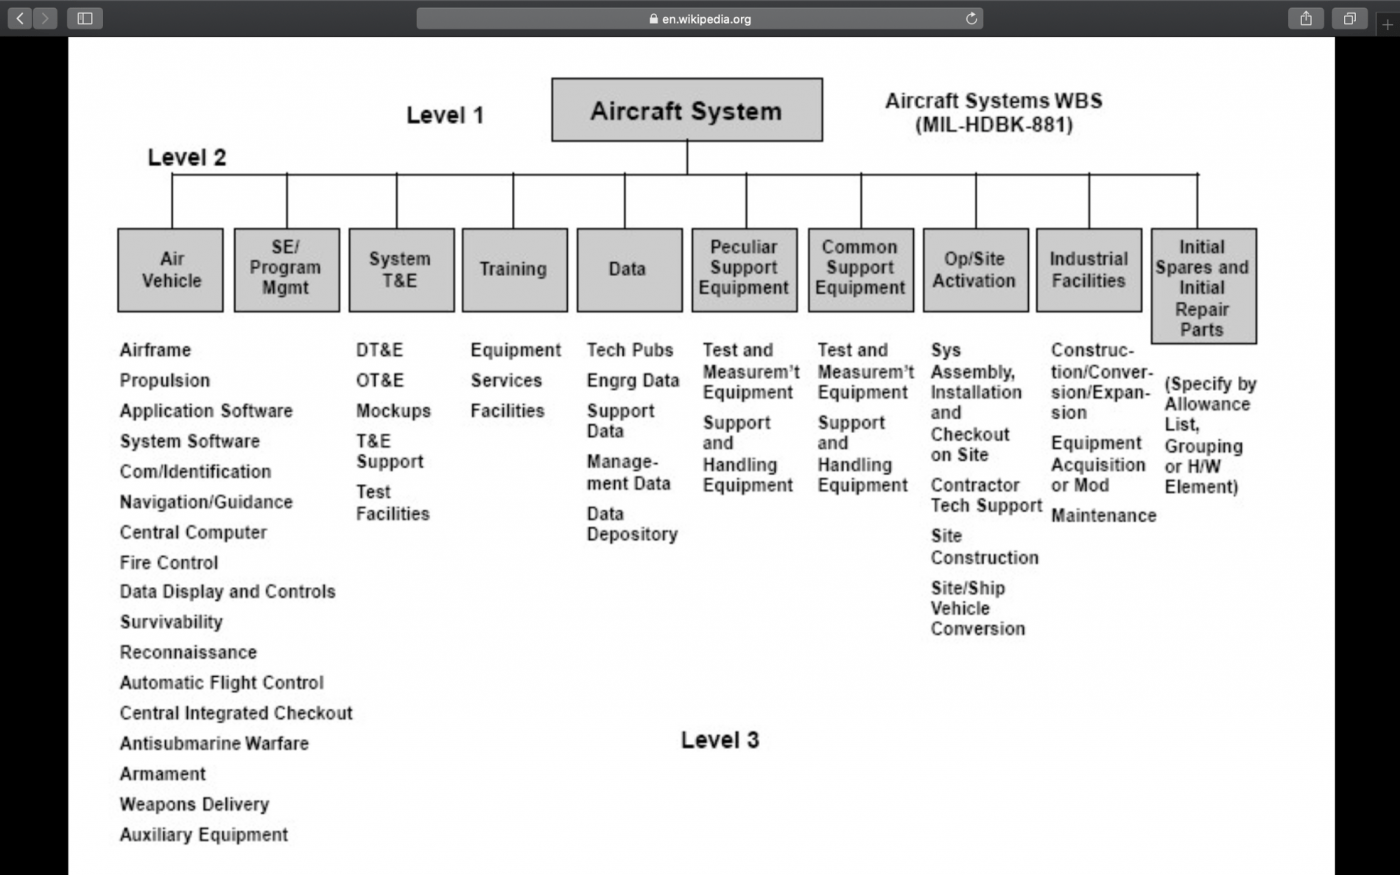 Work breakdown structure (WBS) chart